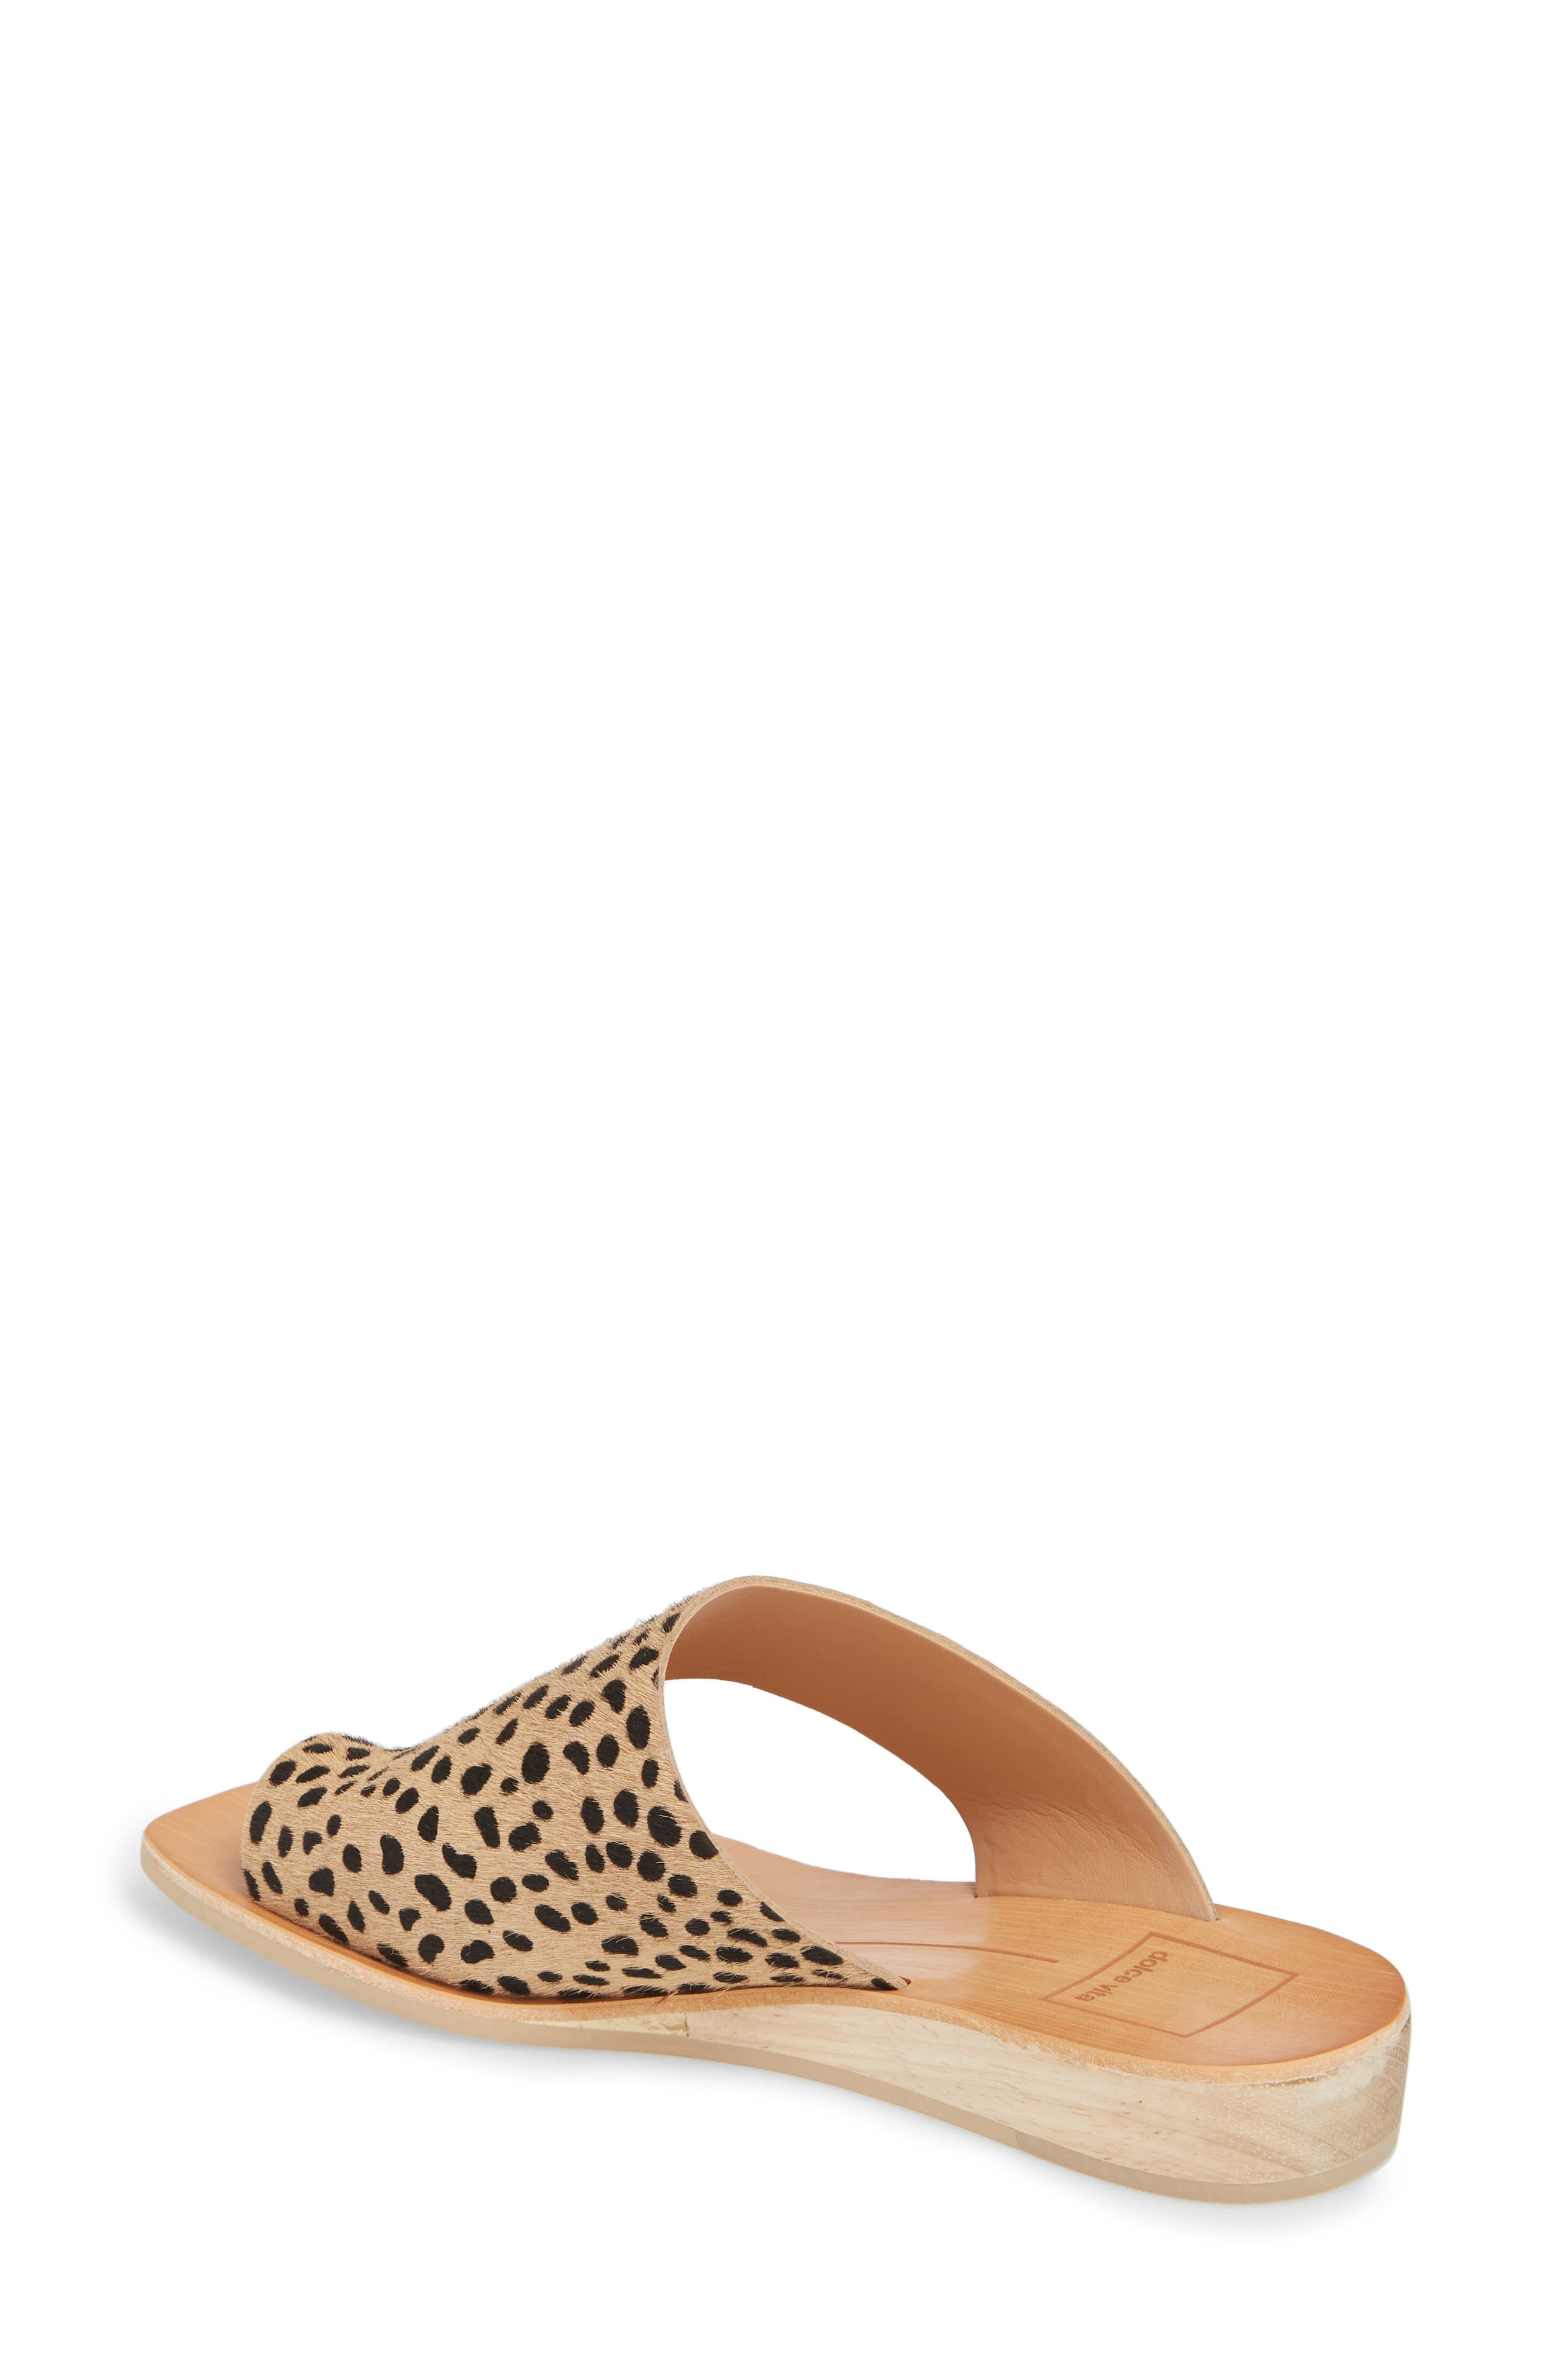 Hazle Genuine Calf Hair Sandal,                             Alternate thumbnail 6, color,